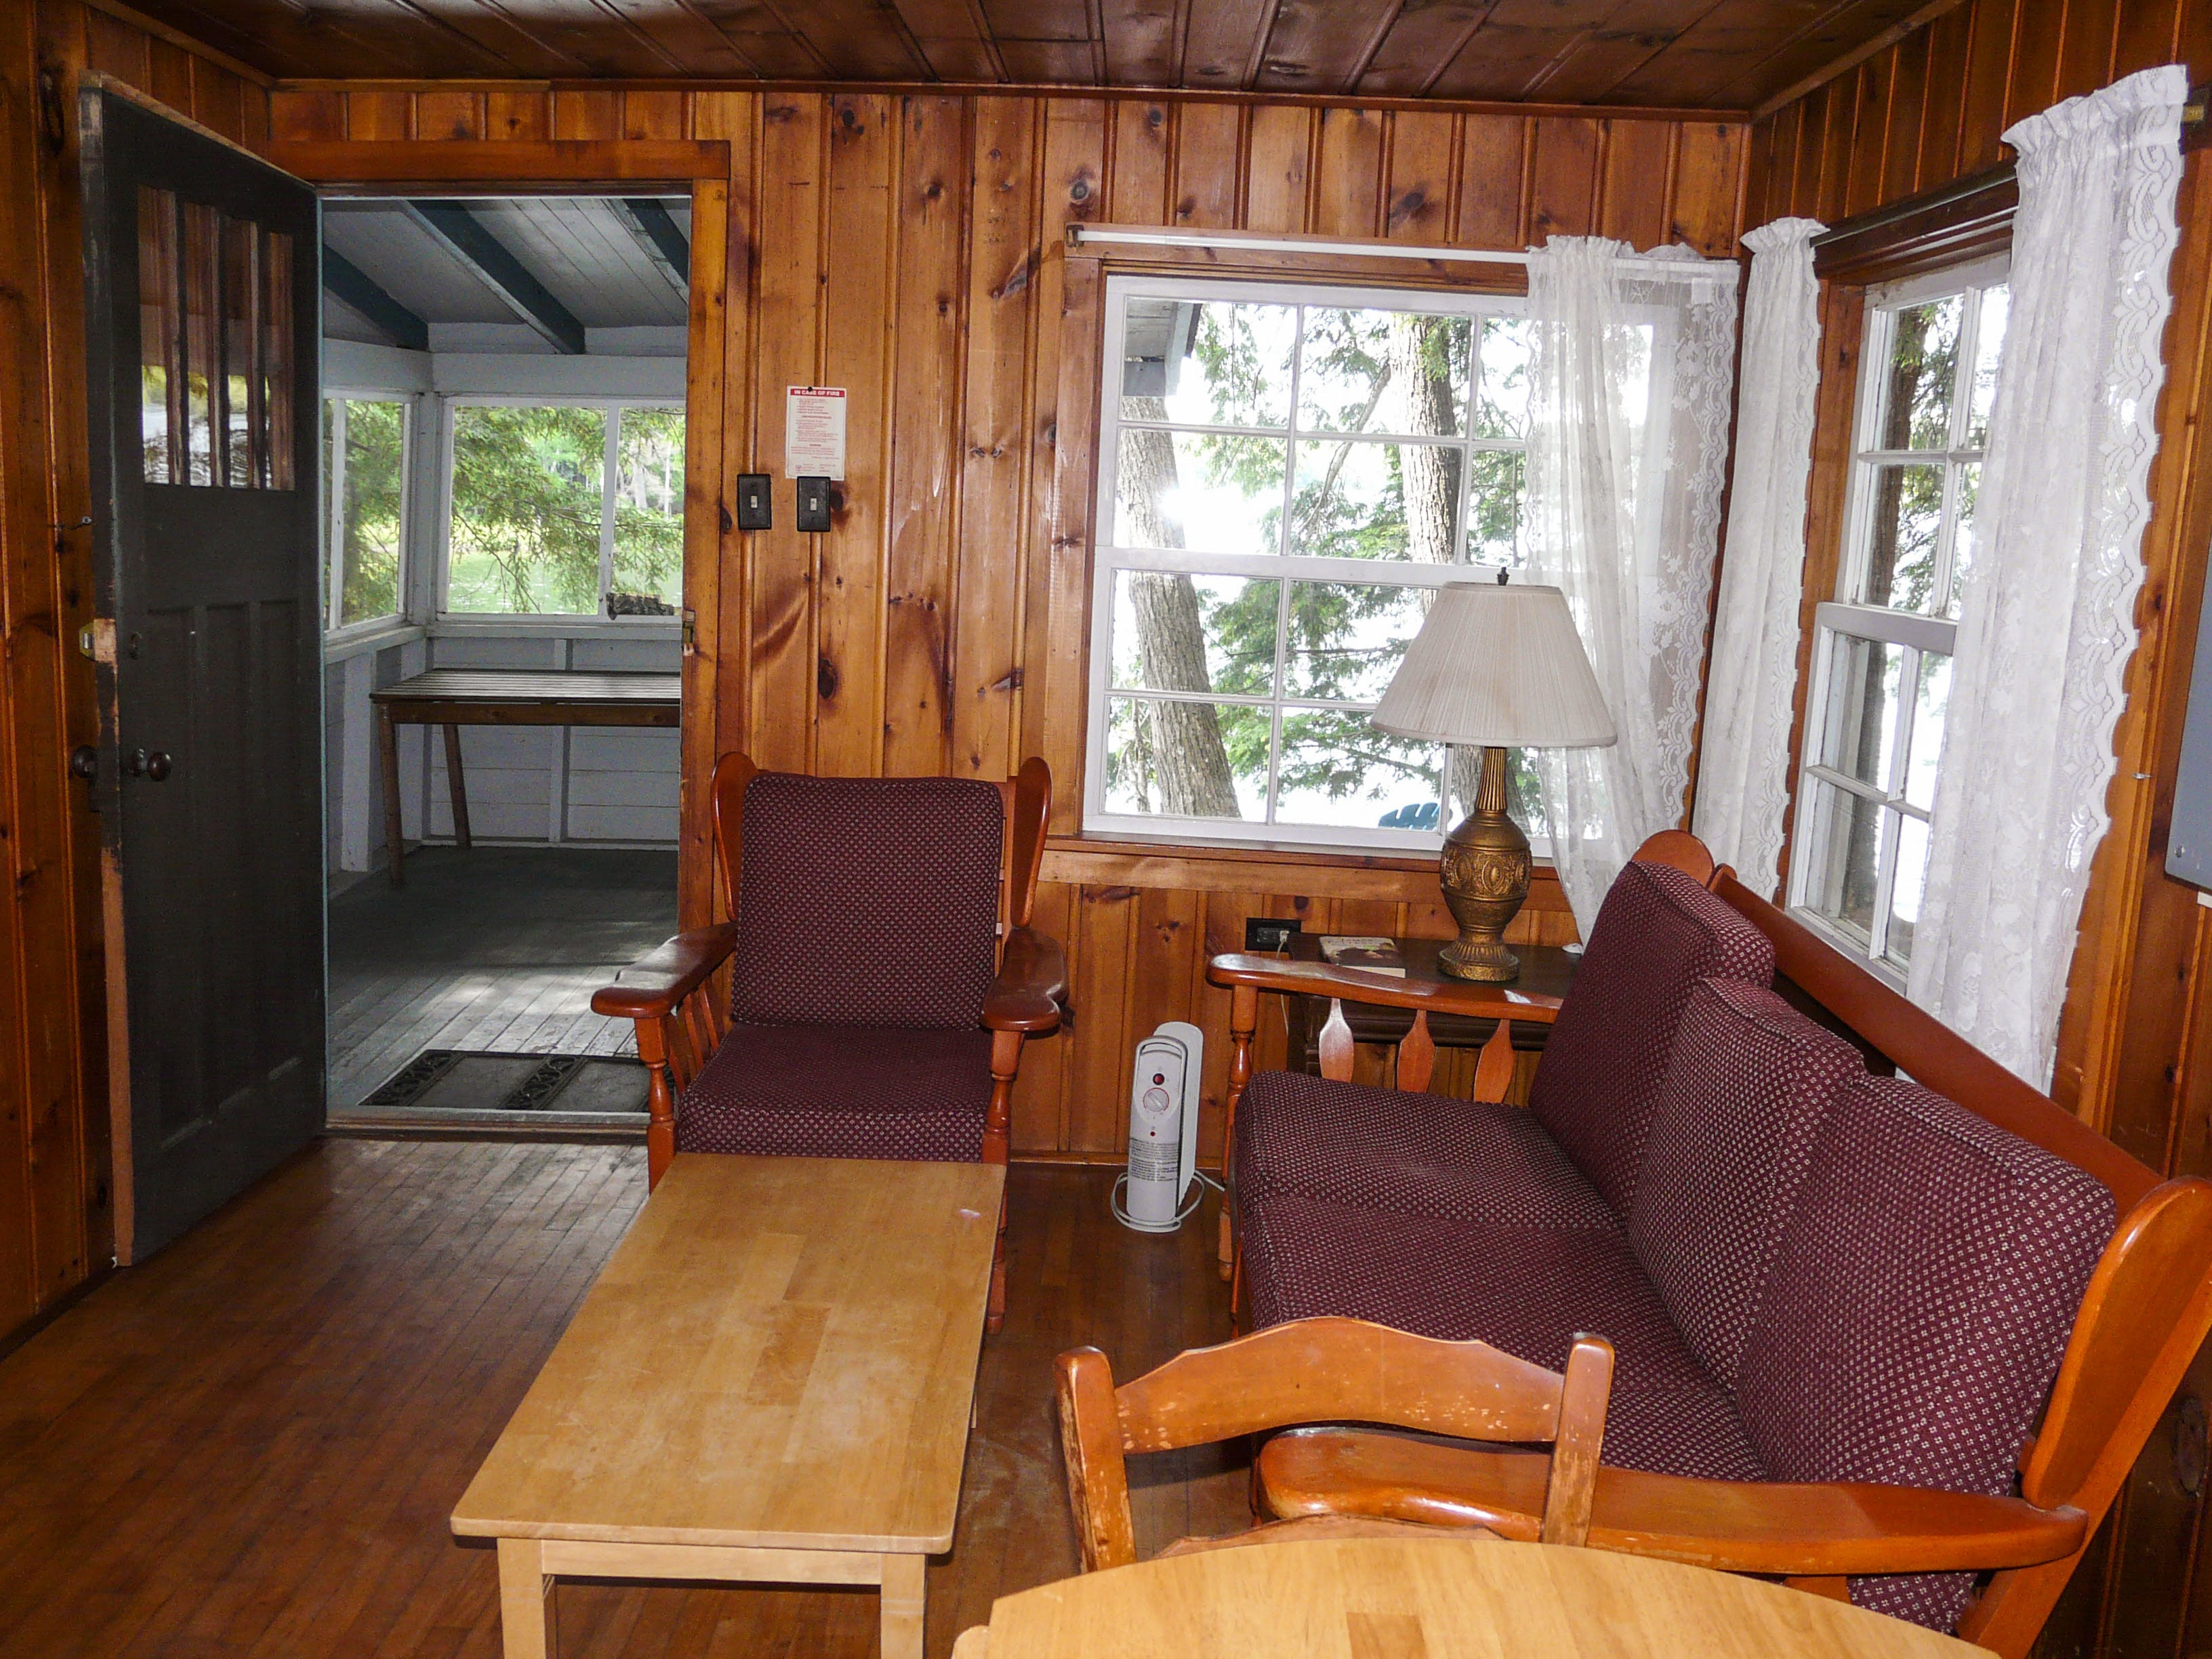 bedroom sun room muskoka rental on ontario rebecca master rentals cottage huntsville lake